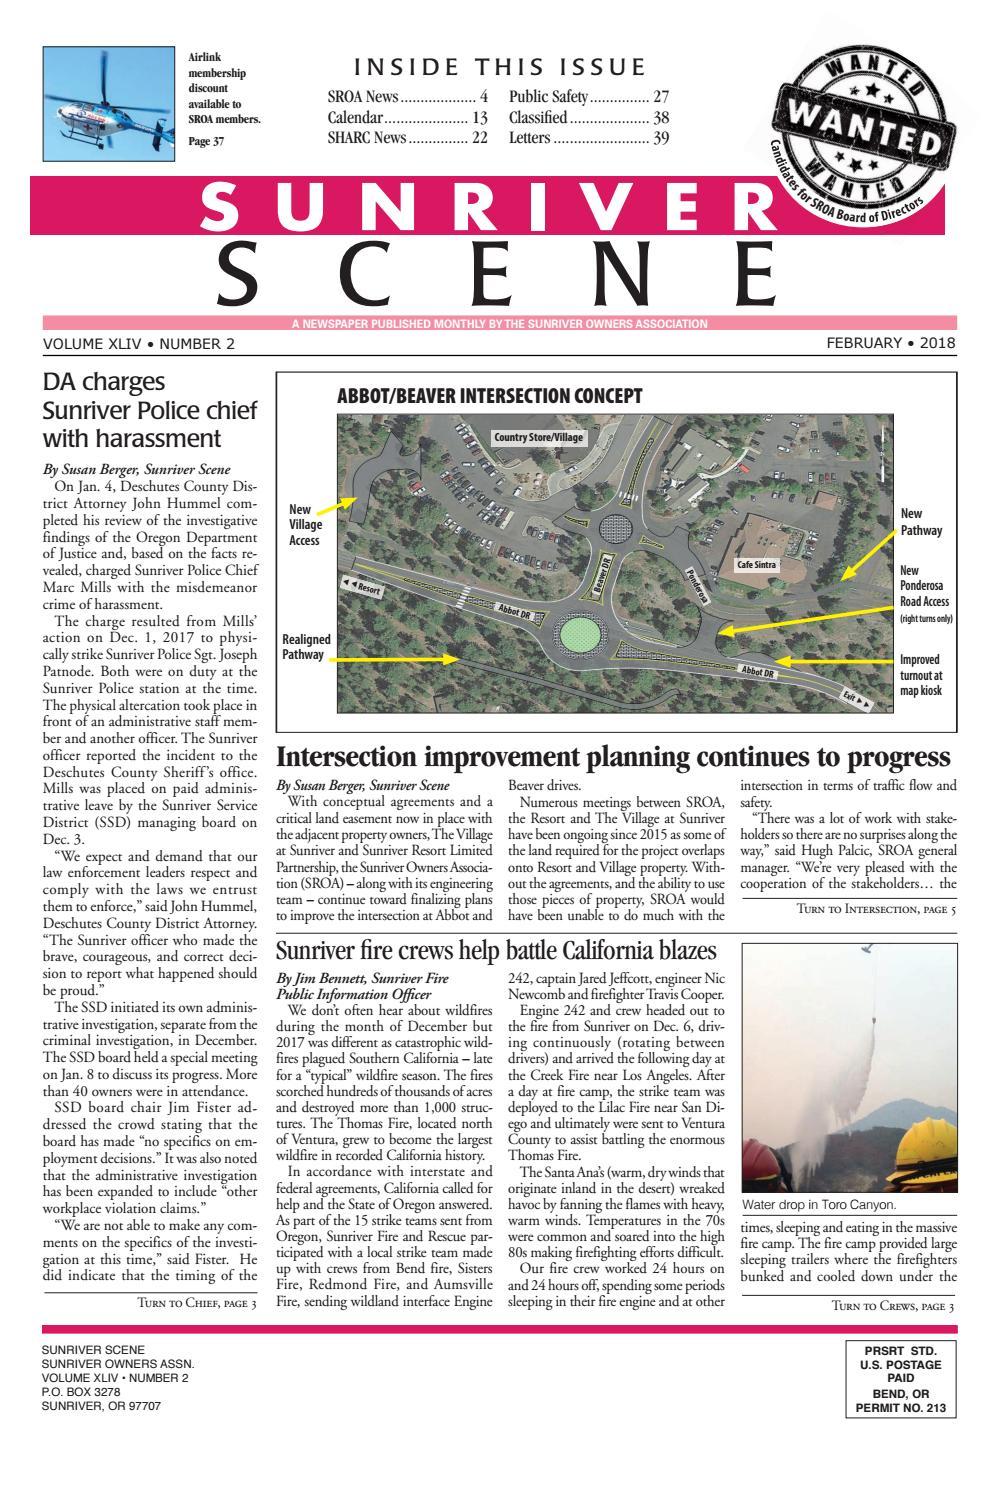 February 2018 sunriver scene by sunriver scene issuu fandeluxe Choice Image